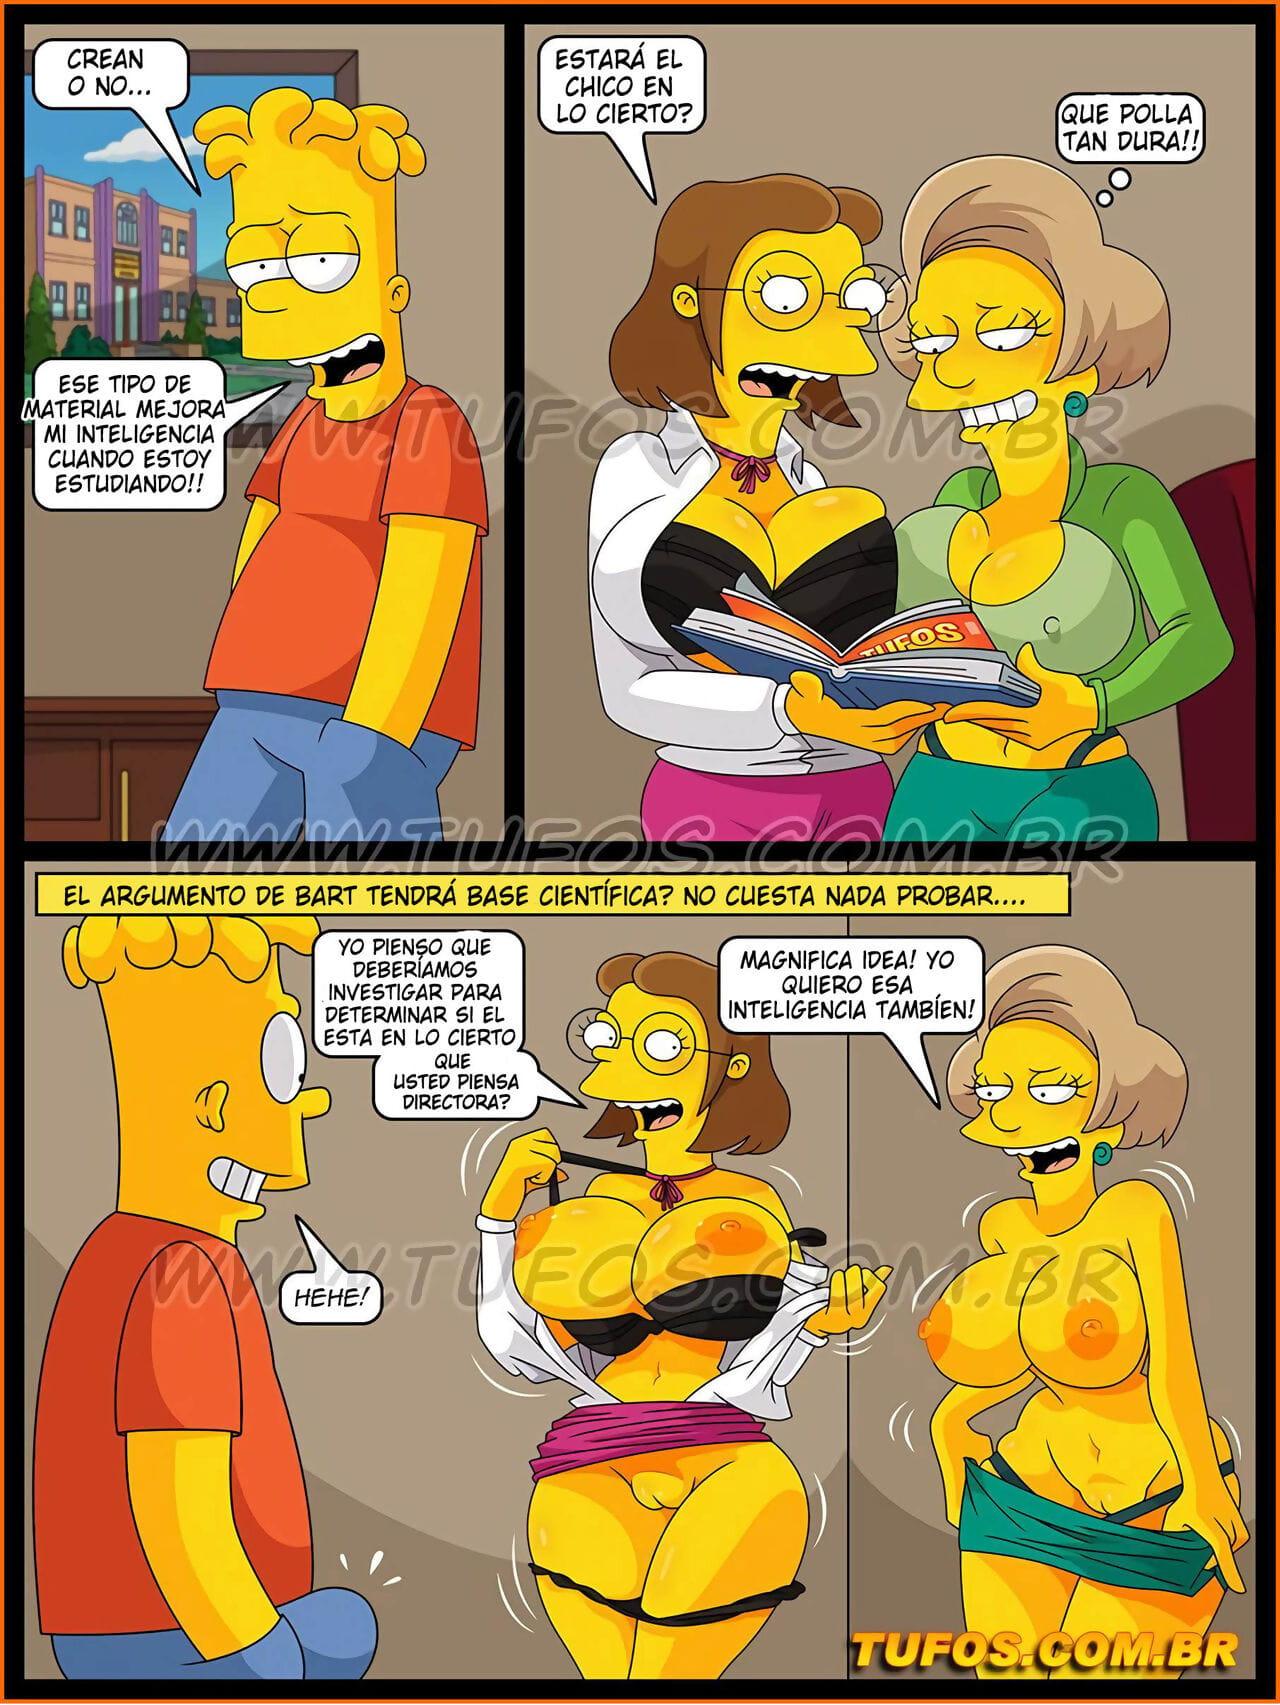 Comic die simpsons porno free simpsons